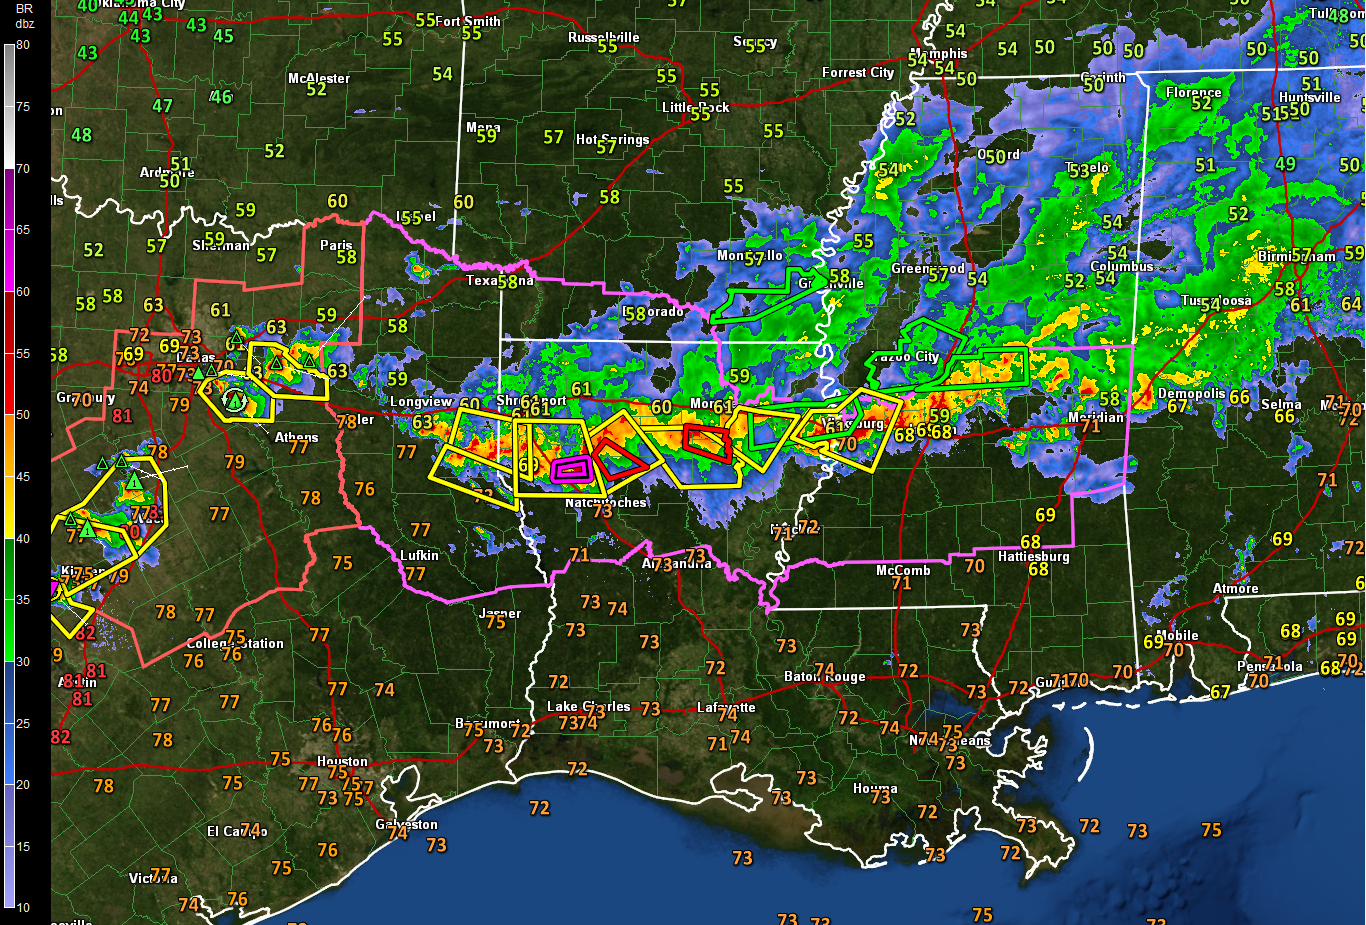 I 20 Louisiana Map.Pds Tornado Warning In Louisiana Central Alabama Remains Stable